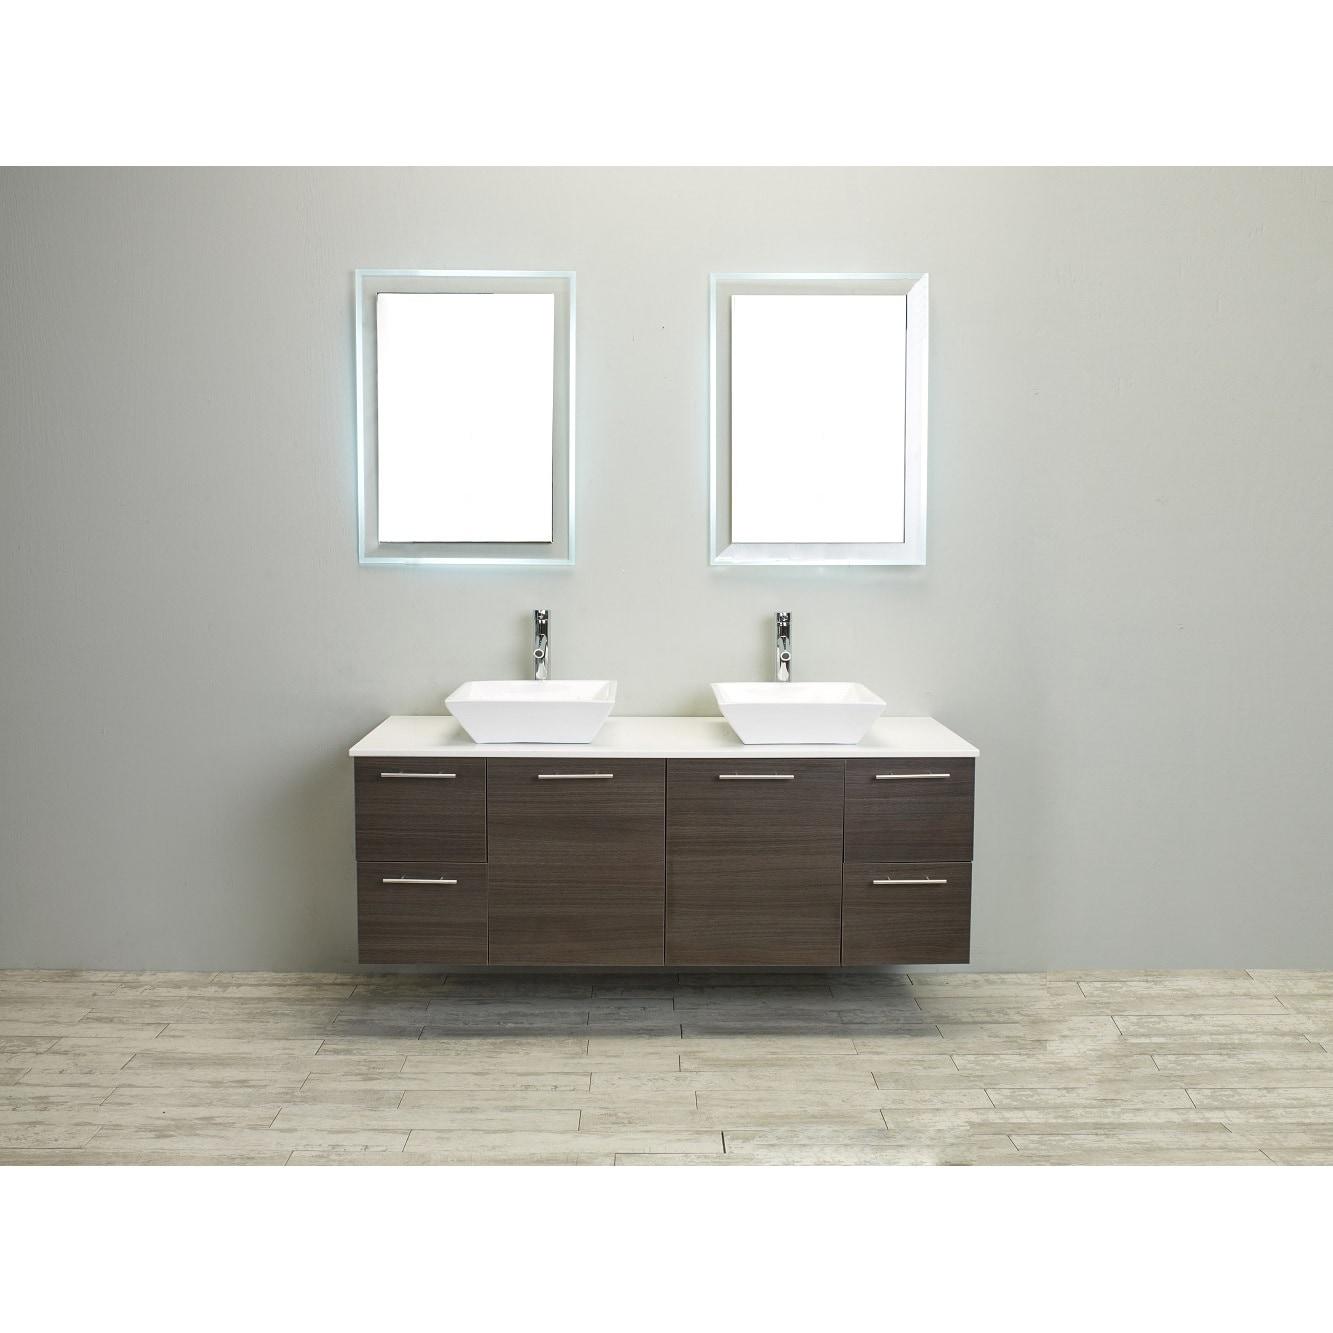 Shop Eviva Luxury 60-inch Grey Oak Bathroom Vanity cabinet - Free ...